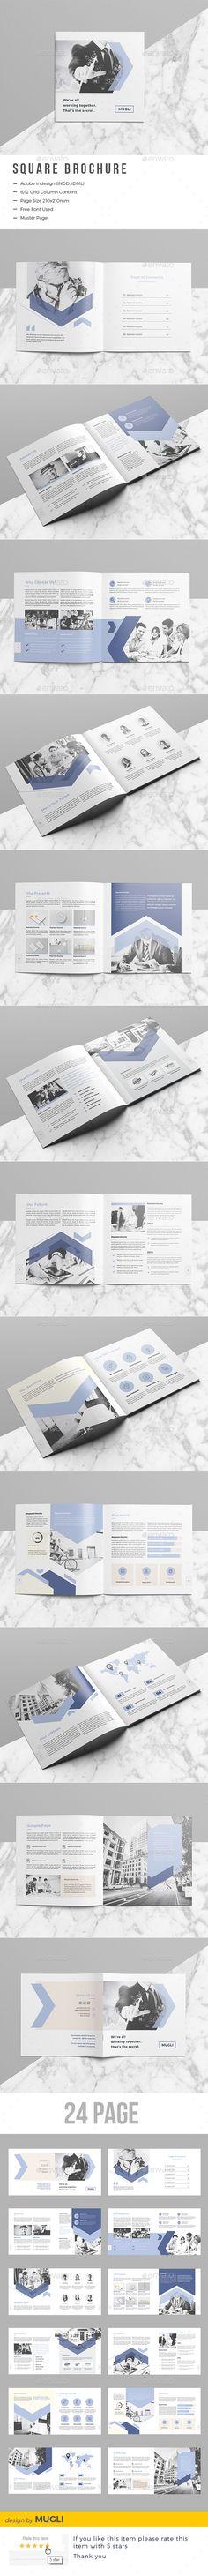 Company Square Brochure - Corporate Brochures Download here : https://graphicriver.net/item/company-square-brochure/19632878?s_rank=140&ref=Al-fatih